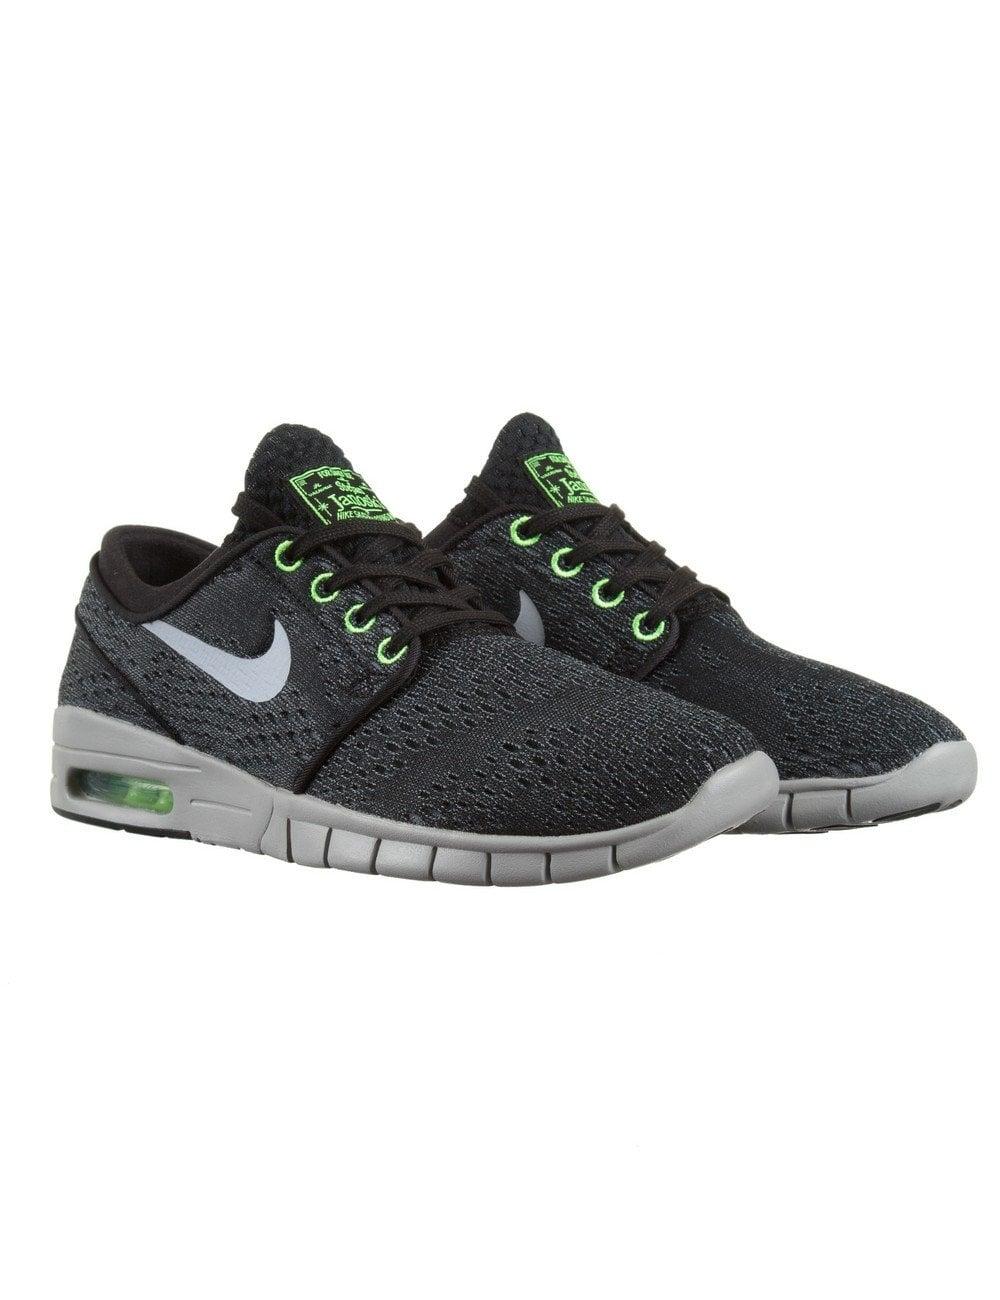 Sacrificio demasiado Pirata  Nike SB Stefan Janoski Max Shoes - Black/Wolf Grey - Footwear from Fat  Buddha Store UK